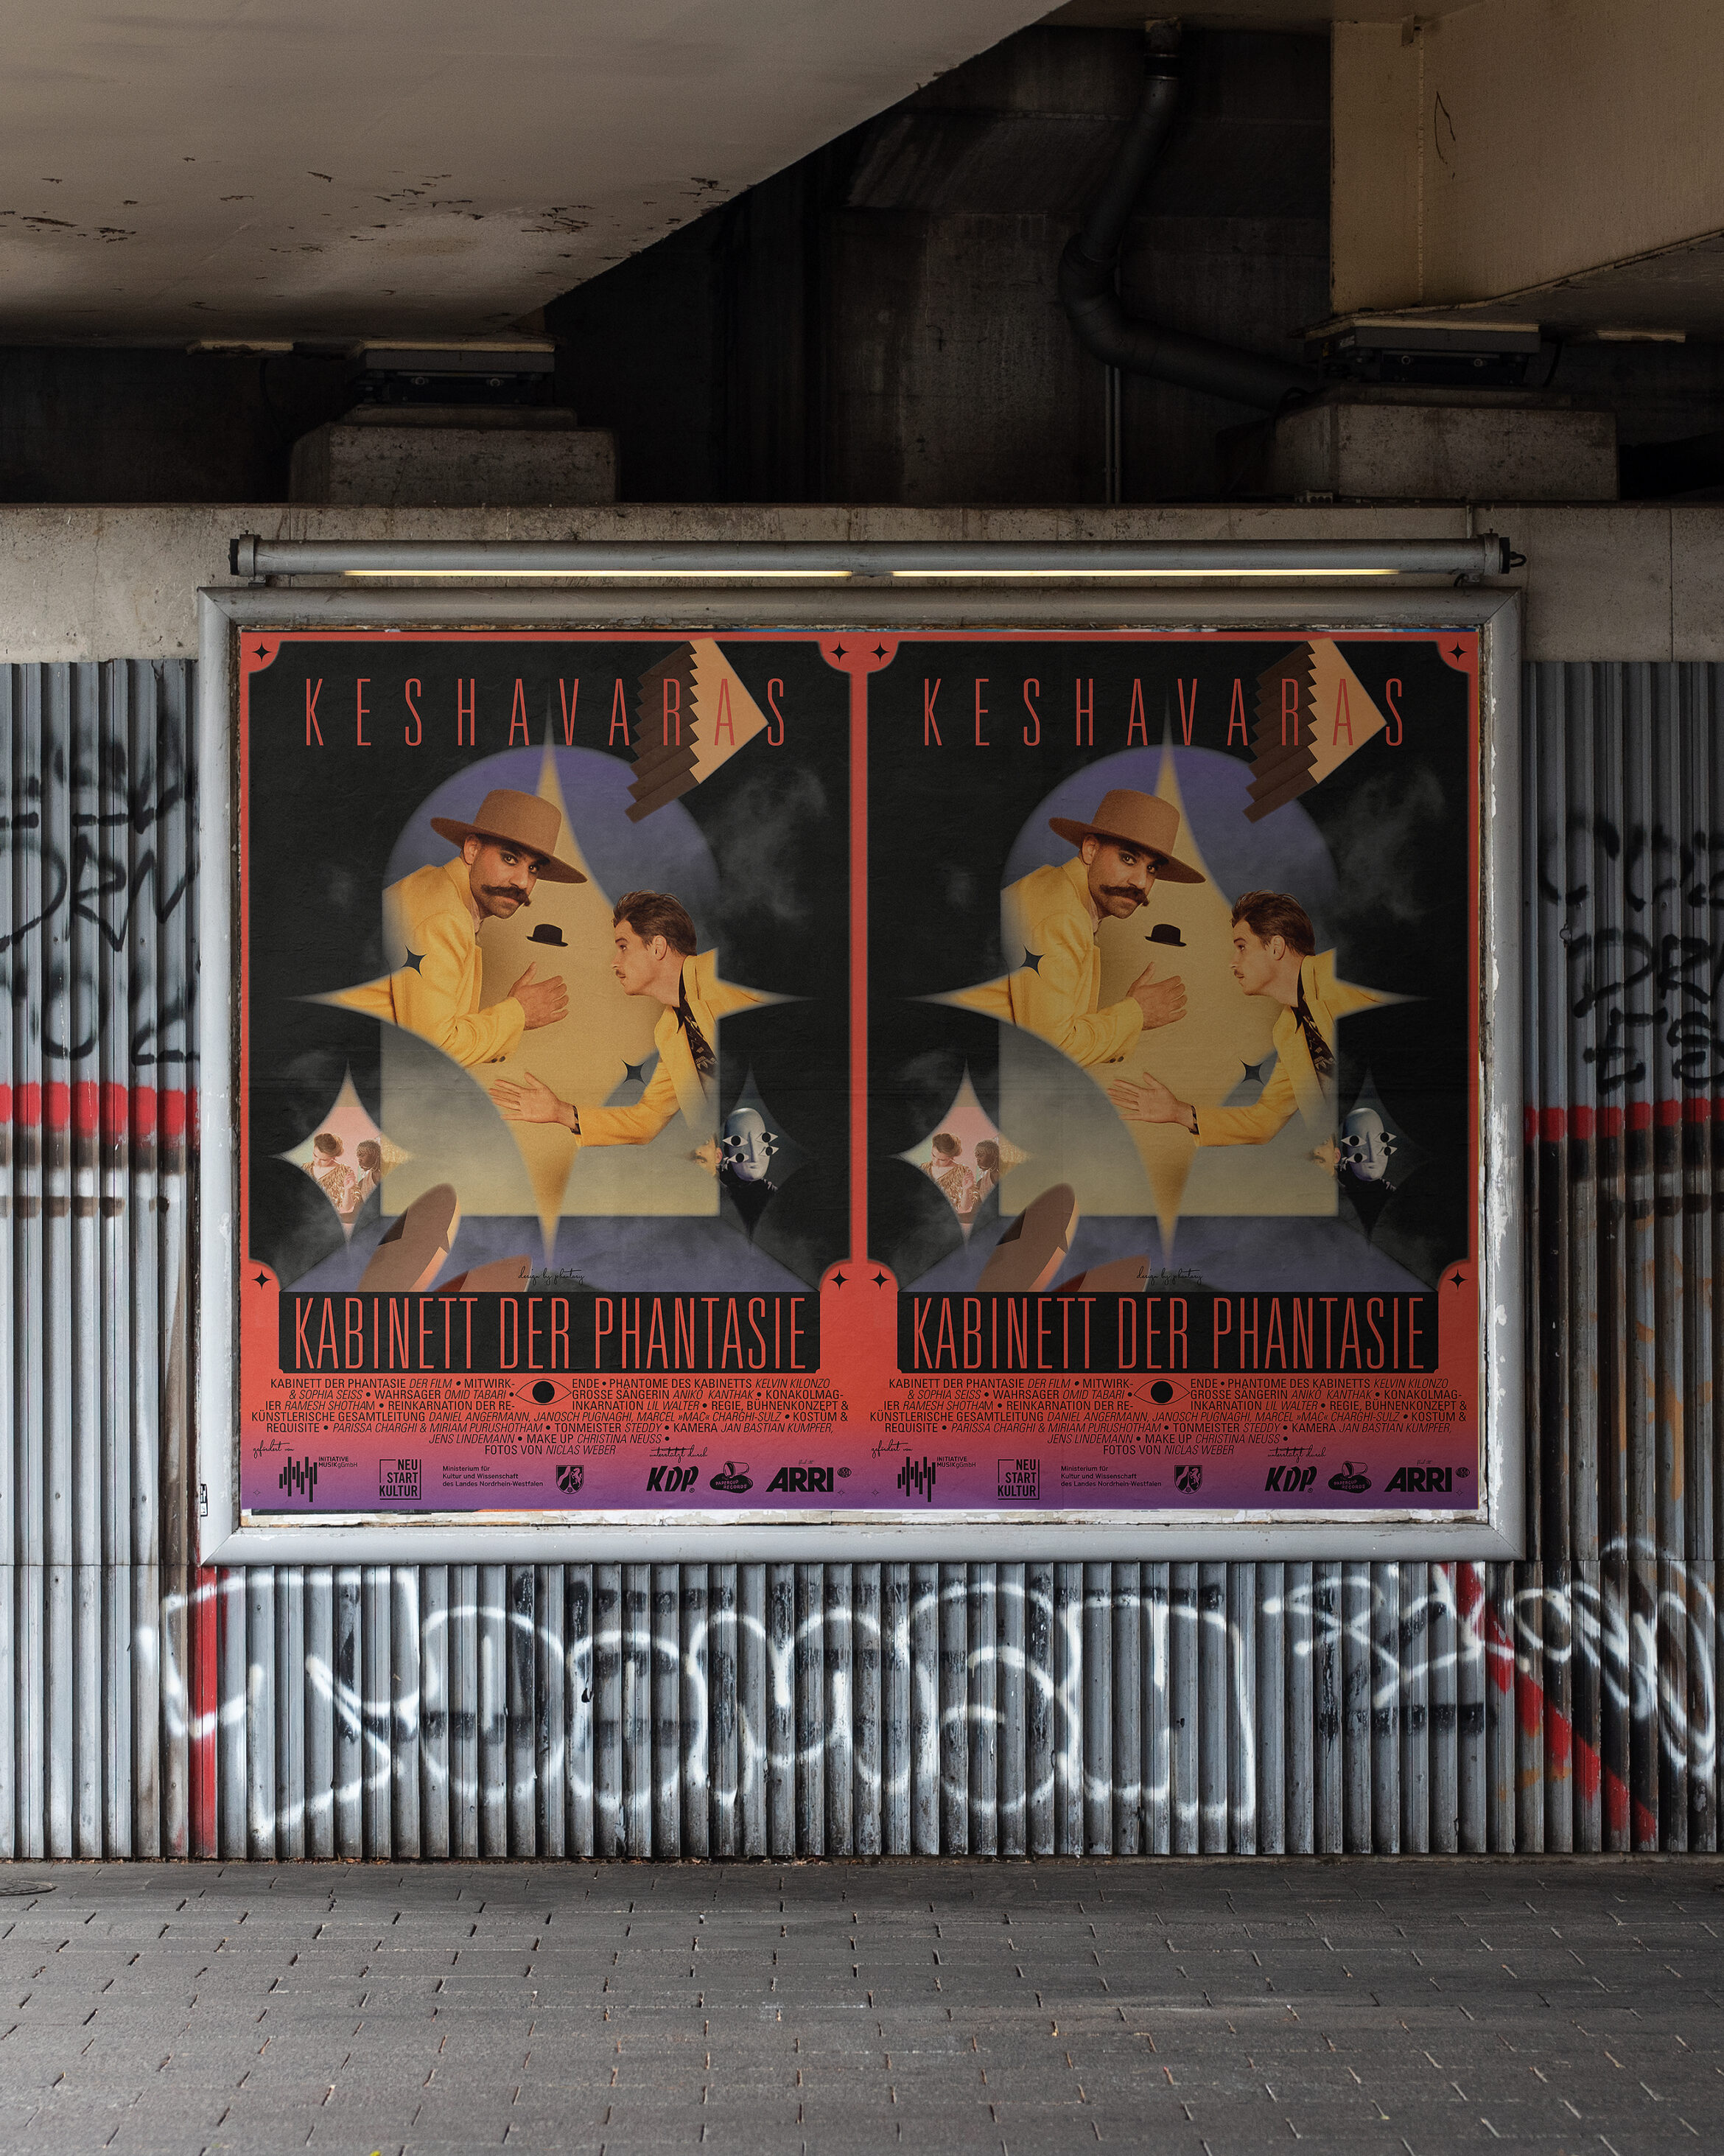 Plakat |Wand |Stadt | Schrift | Phantasie